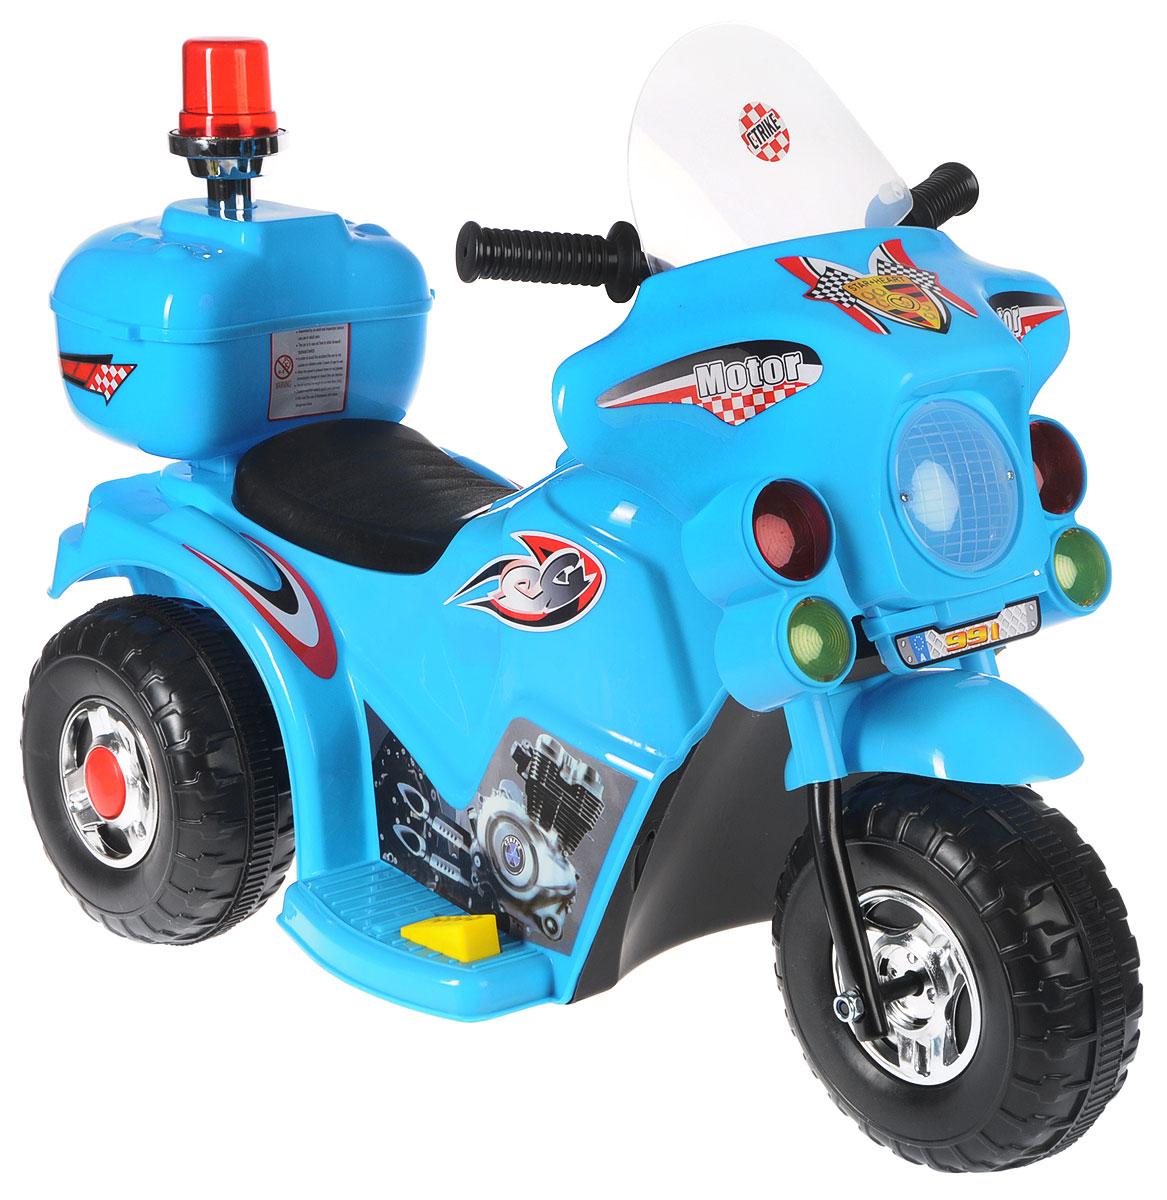 G120 Мотоцикл детский на аккумуляторе с маячком цвет голубой 1004672